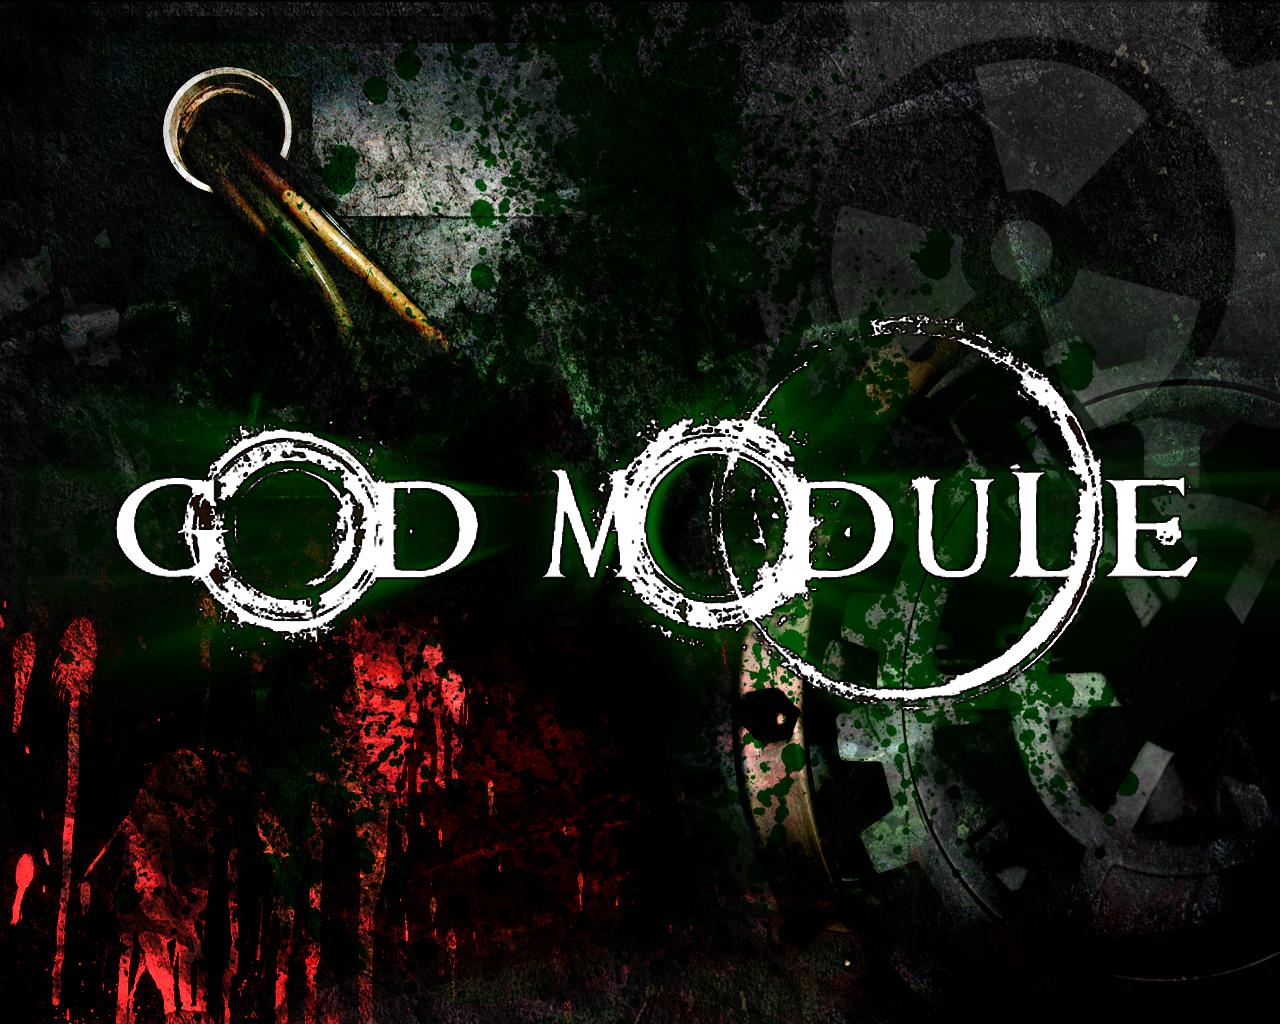 http://fc02.deviantart.net/fs18/f/2007/136/2/7/God_Module_wallpaper_by_ElSpurgo.png